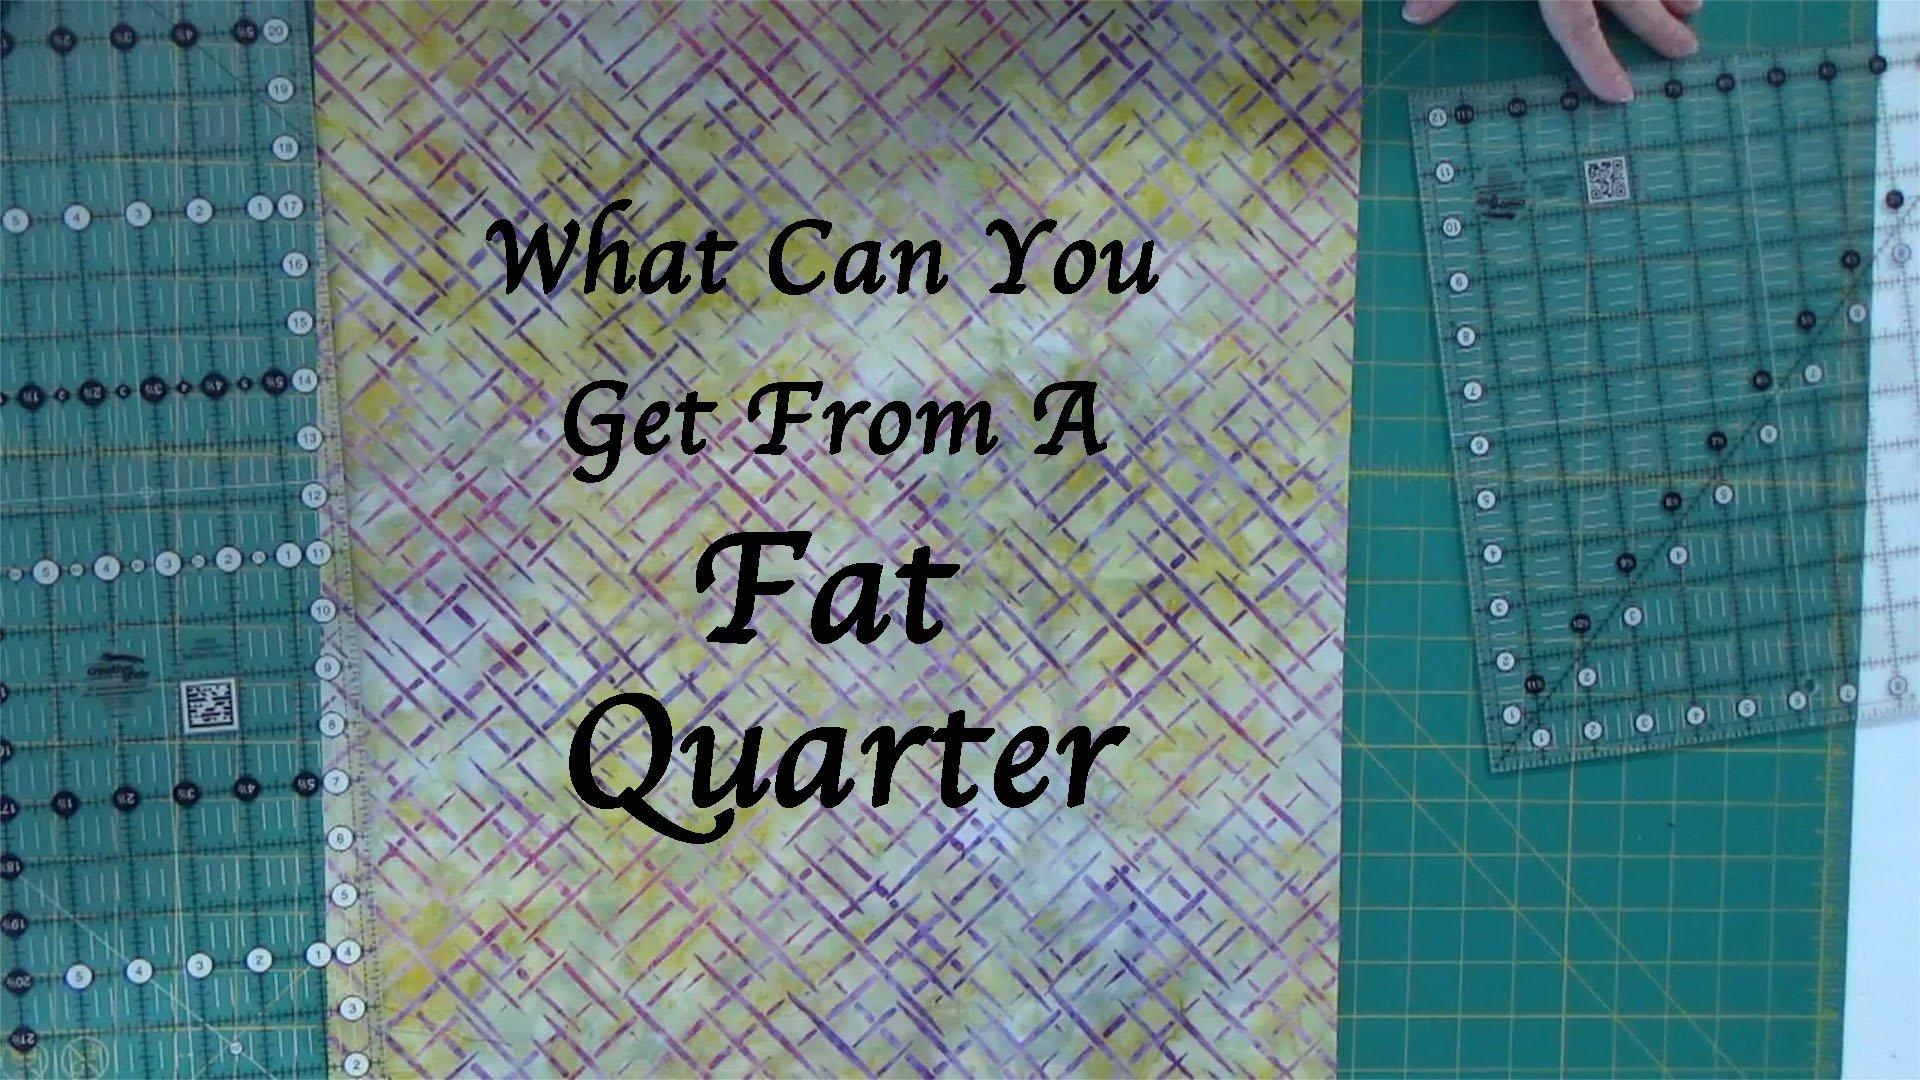 Fat Quarter - What Cuts You Can Get